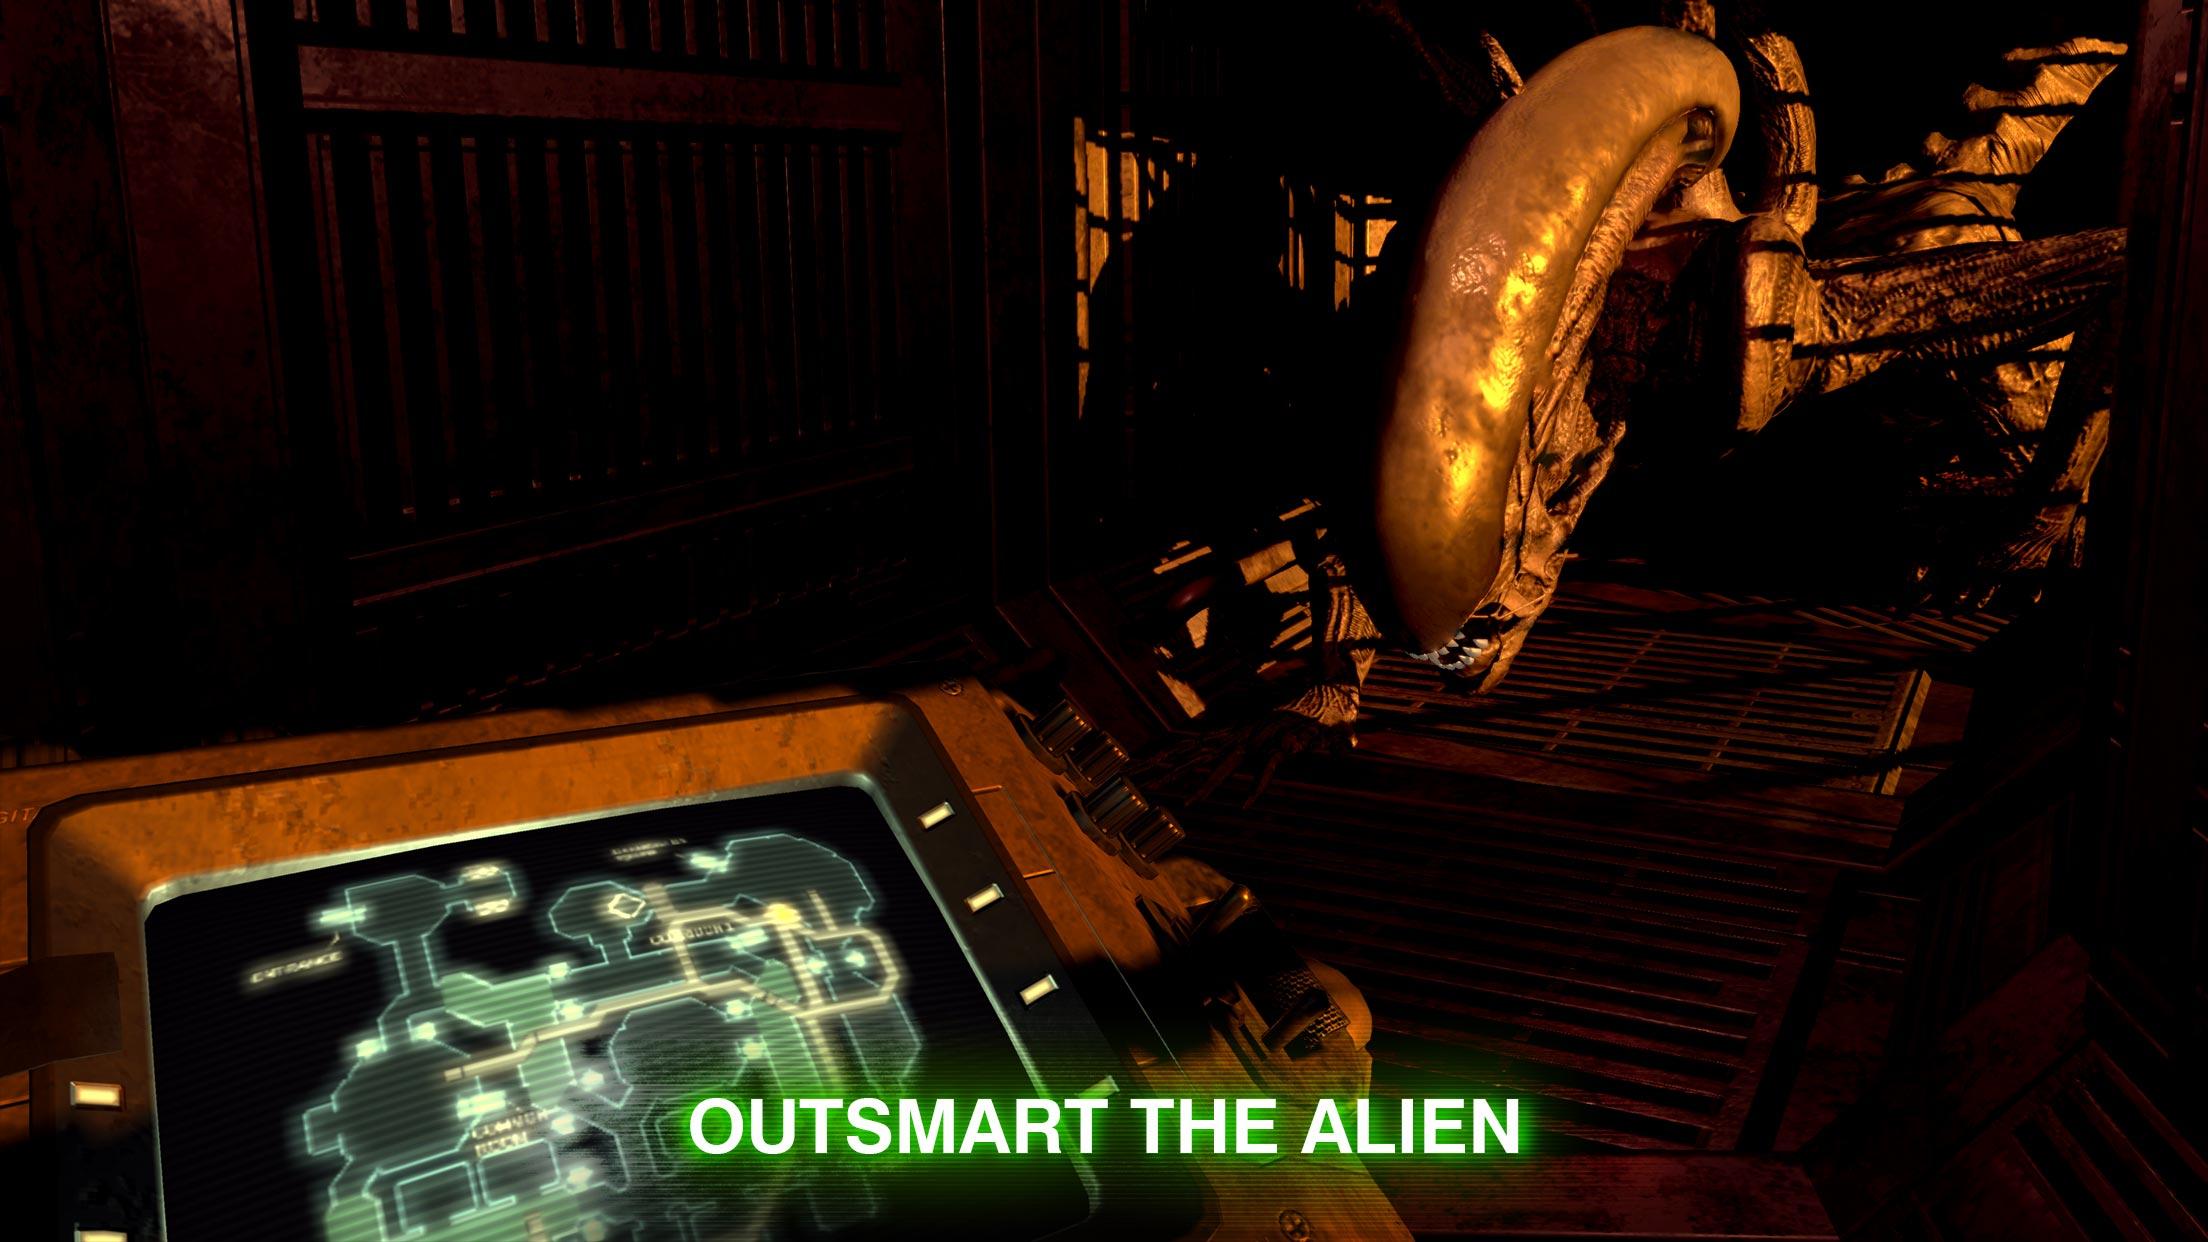 fd199196b2 There s a new Alien game starring Amanda Ripley • Eurogamer.net